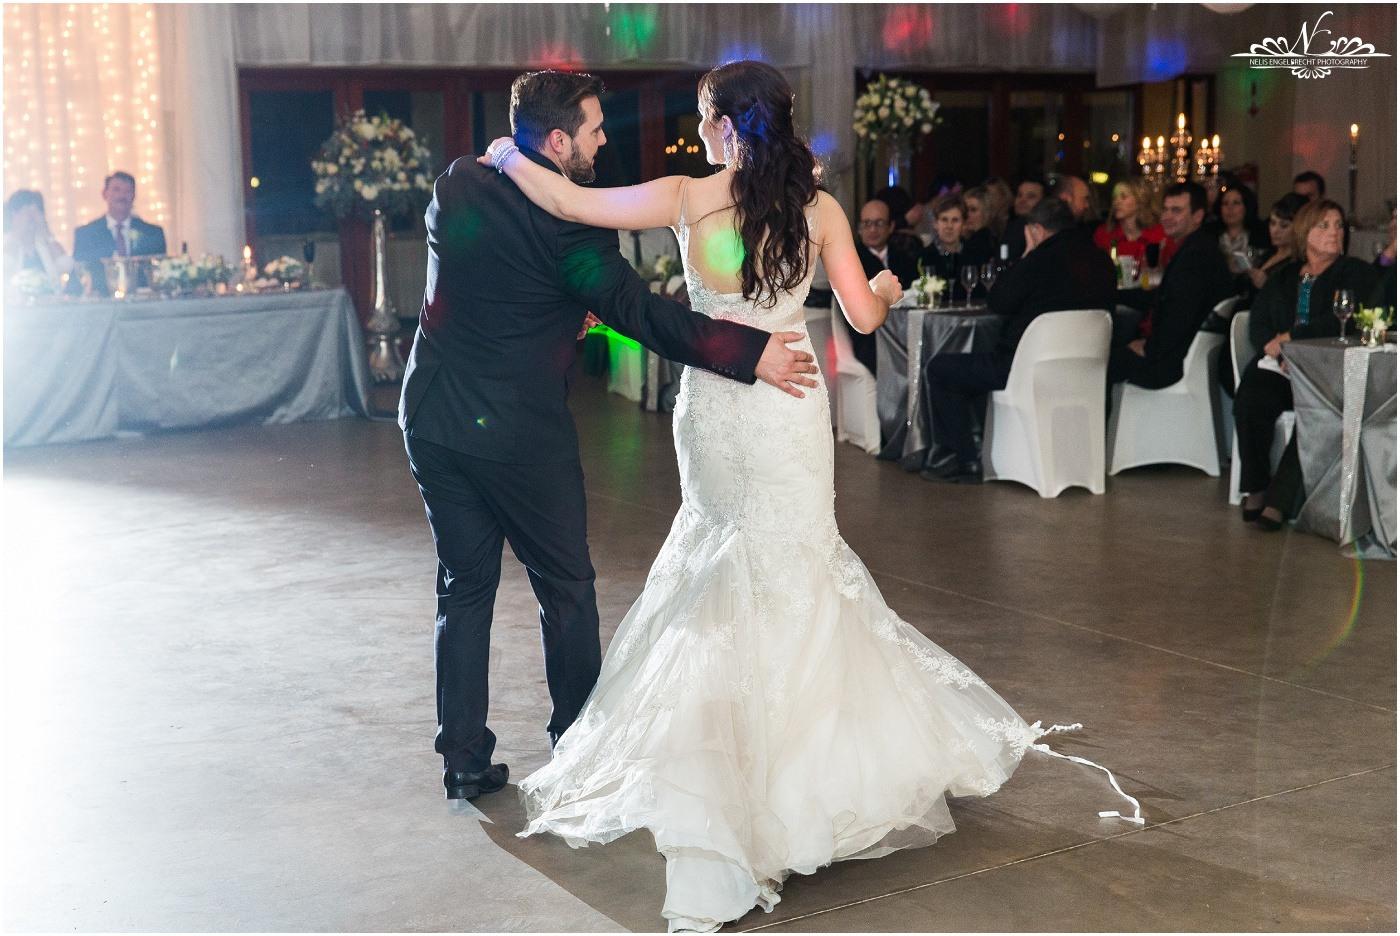 Eensgezind-Wedding-Photos-Nelis-Engelbrecht-Photography-196